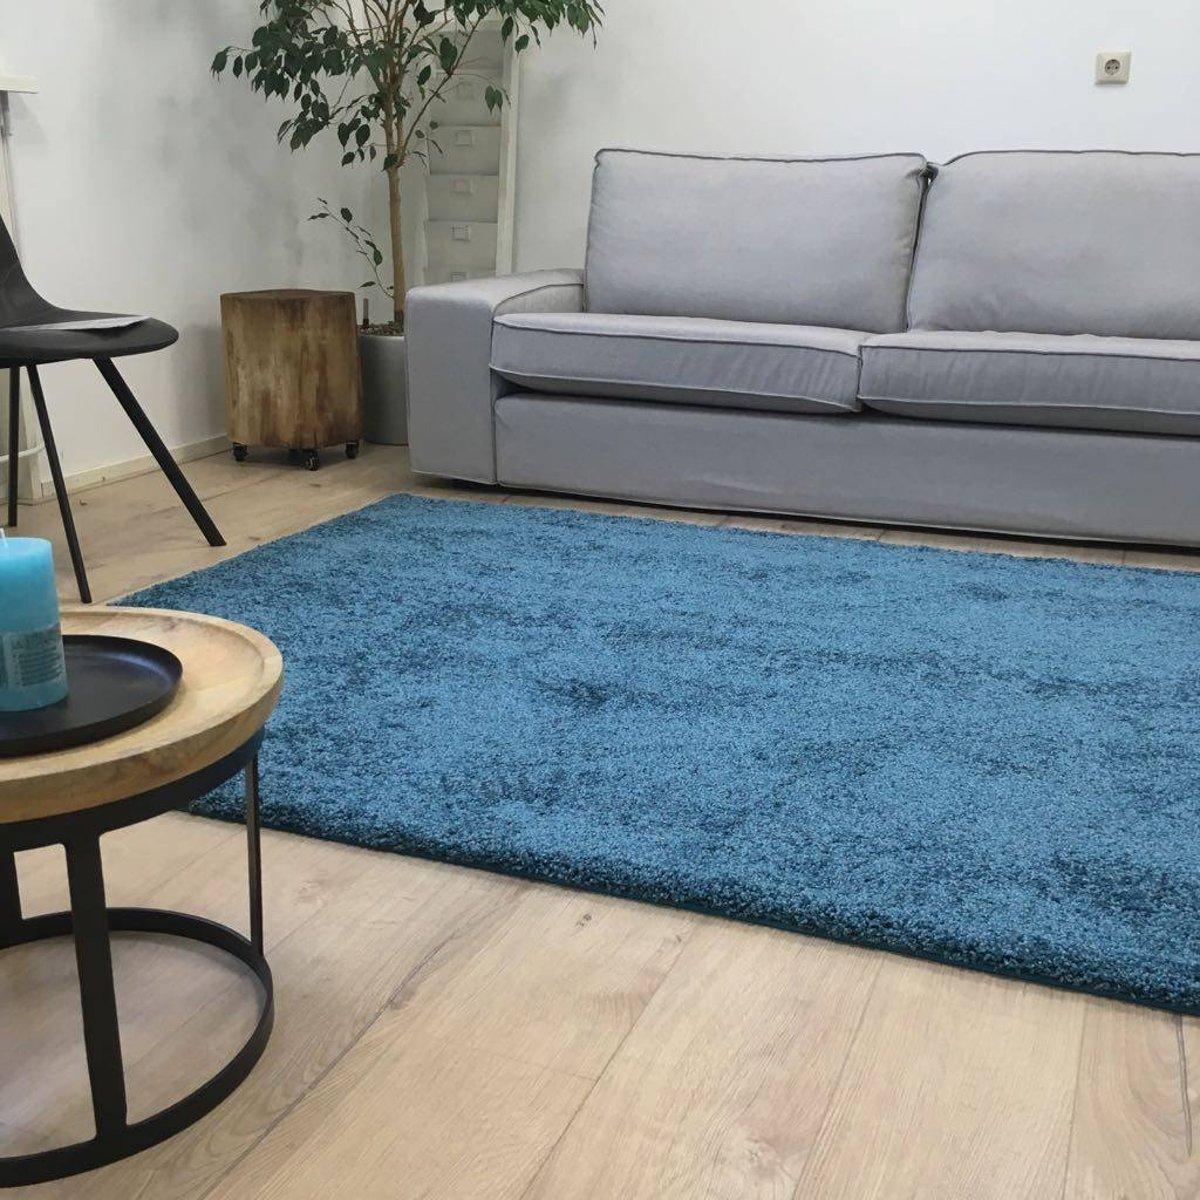 Https Nl P 3 Stuks Piepschuim Harten 9 Cm Styropor Vintage Story Carpet Patchwork 160x210 1 9200000093138129